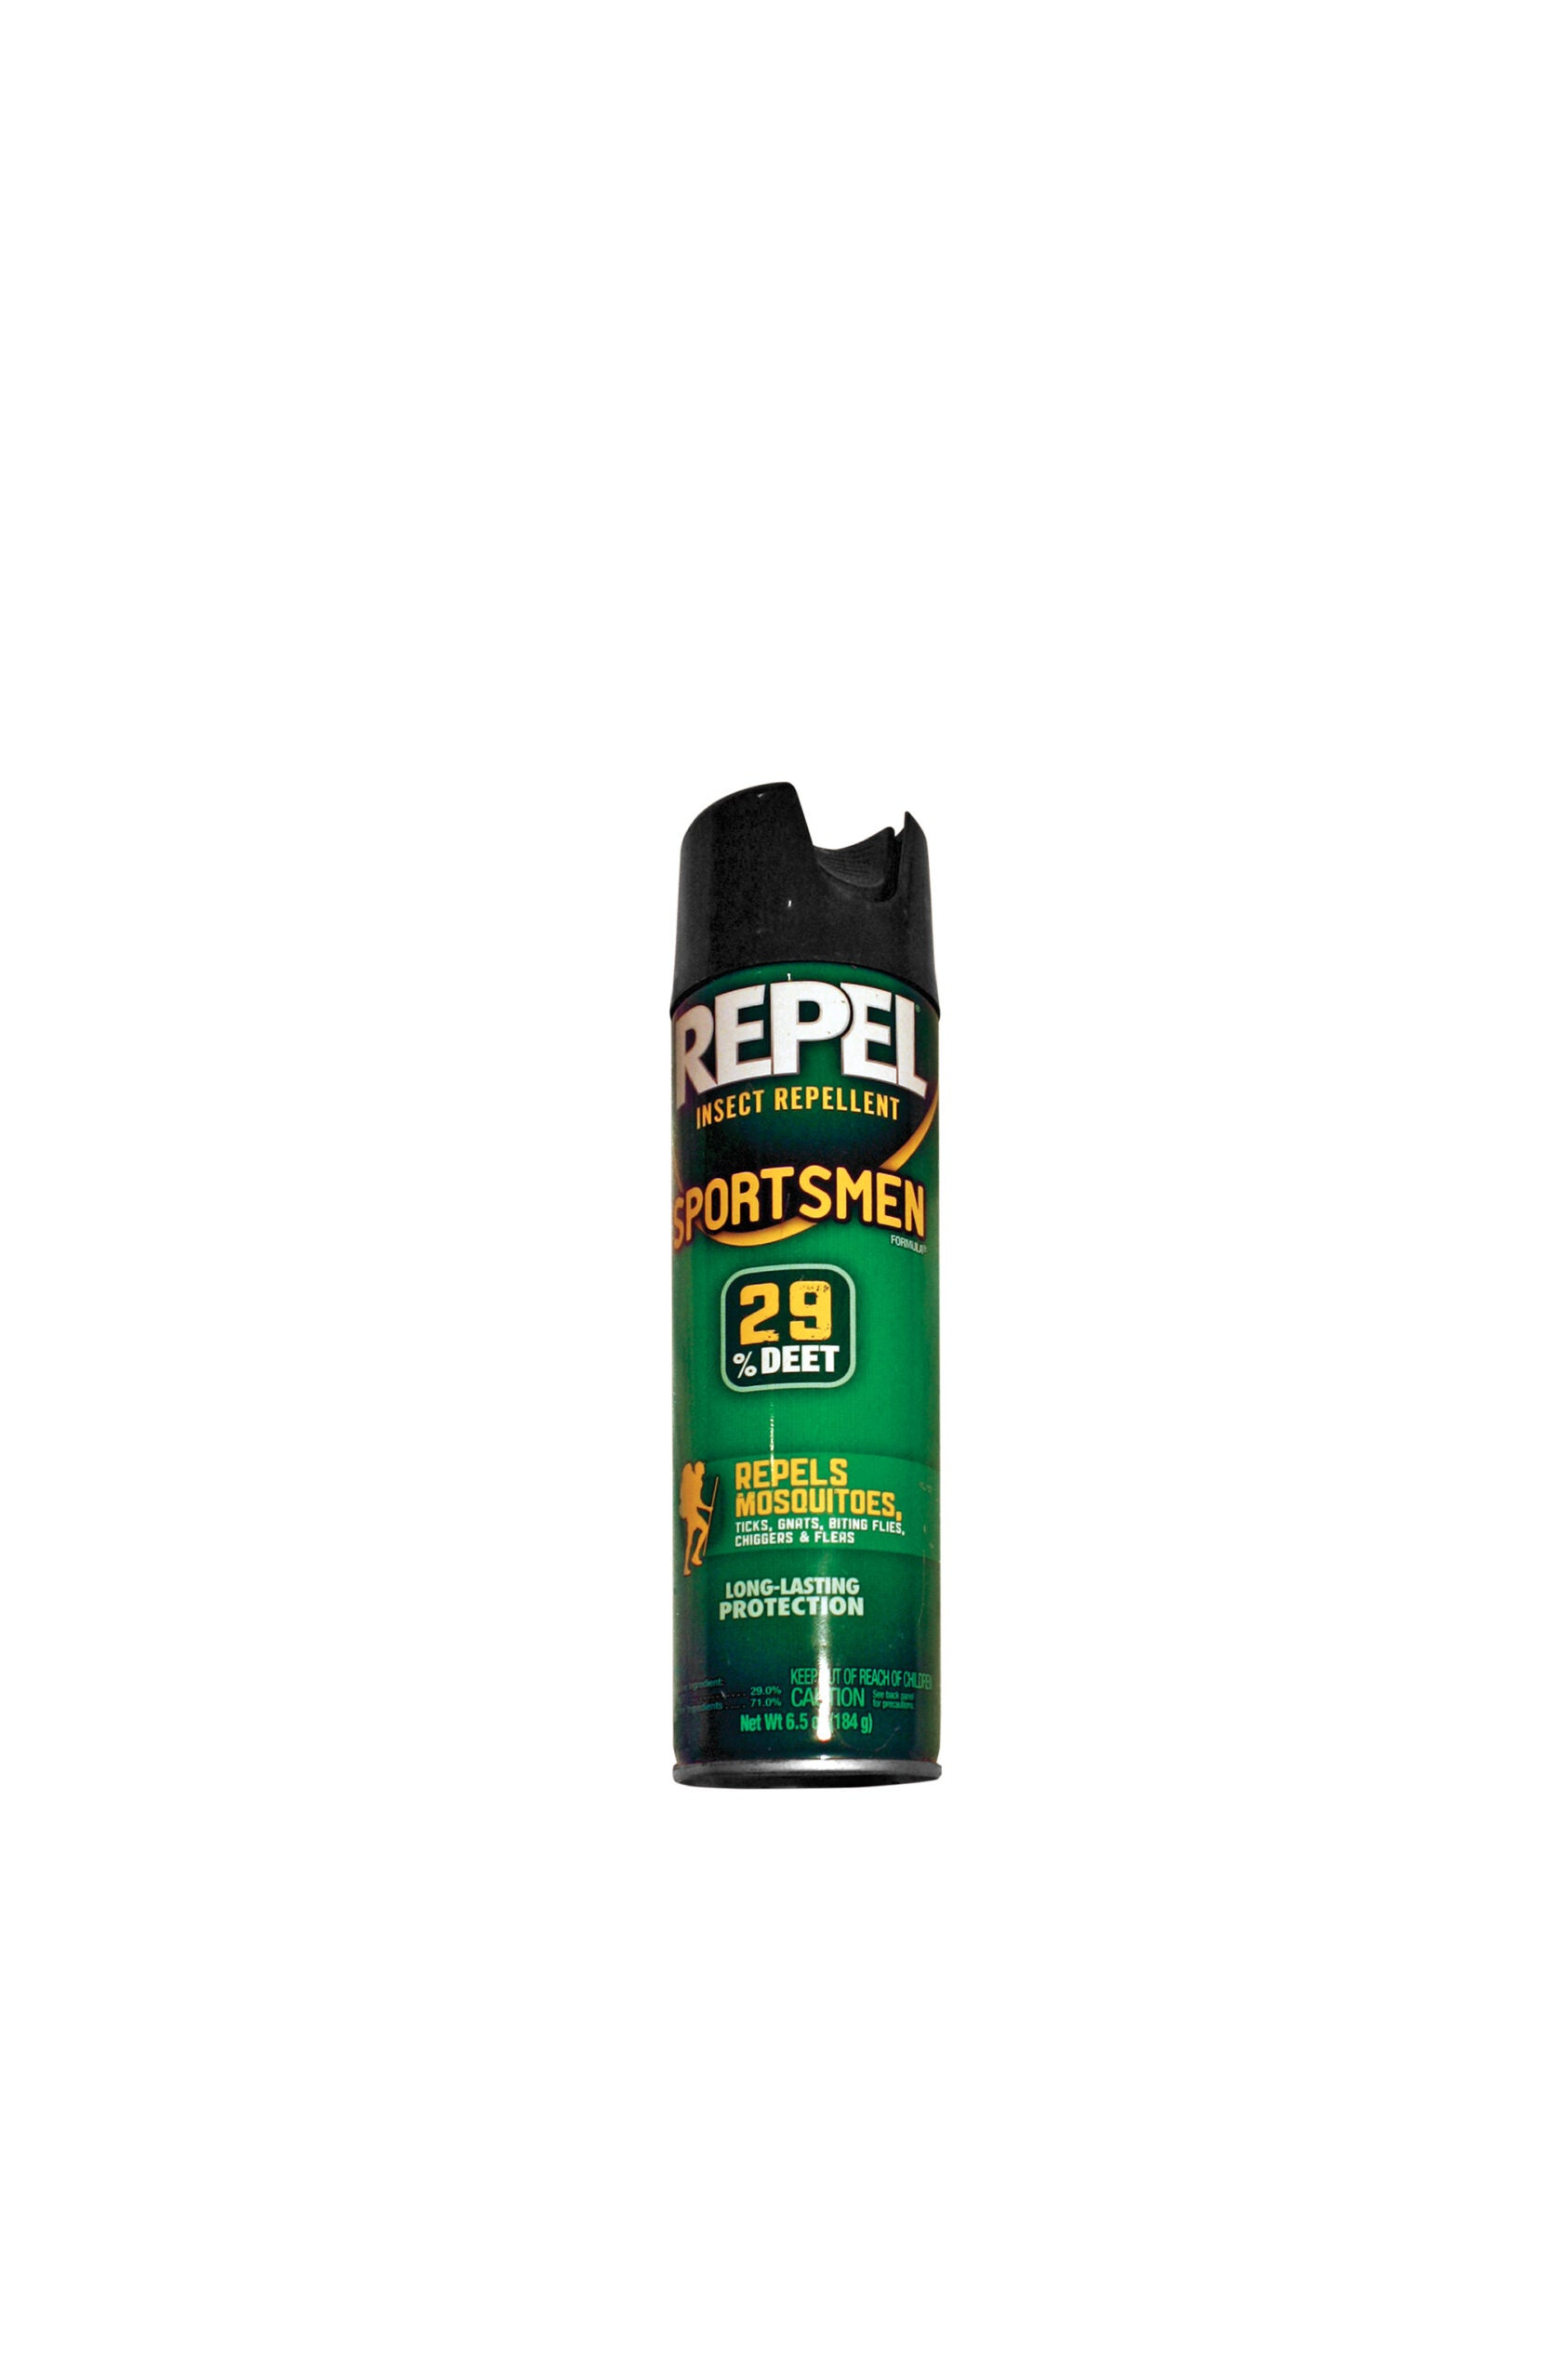 Tick spray.